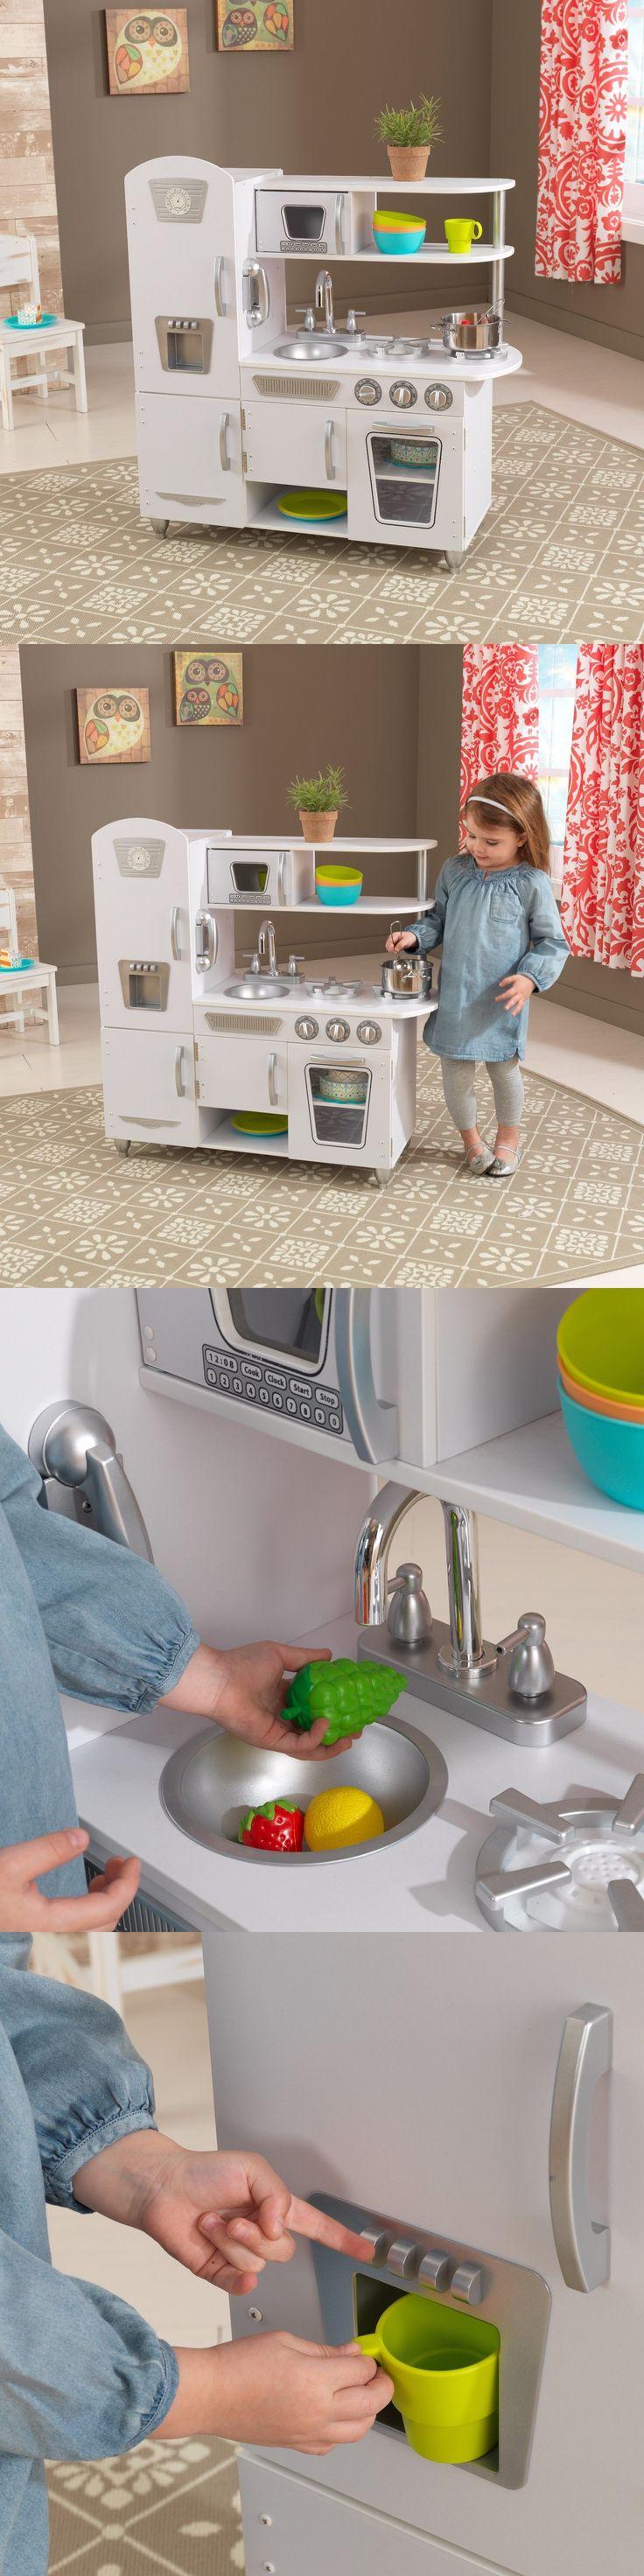 best 25 kidkraft kitchen ideas on pinterest toddler kitchen